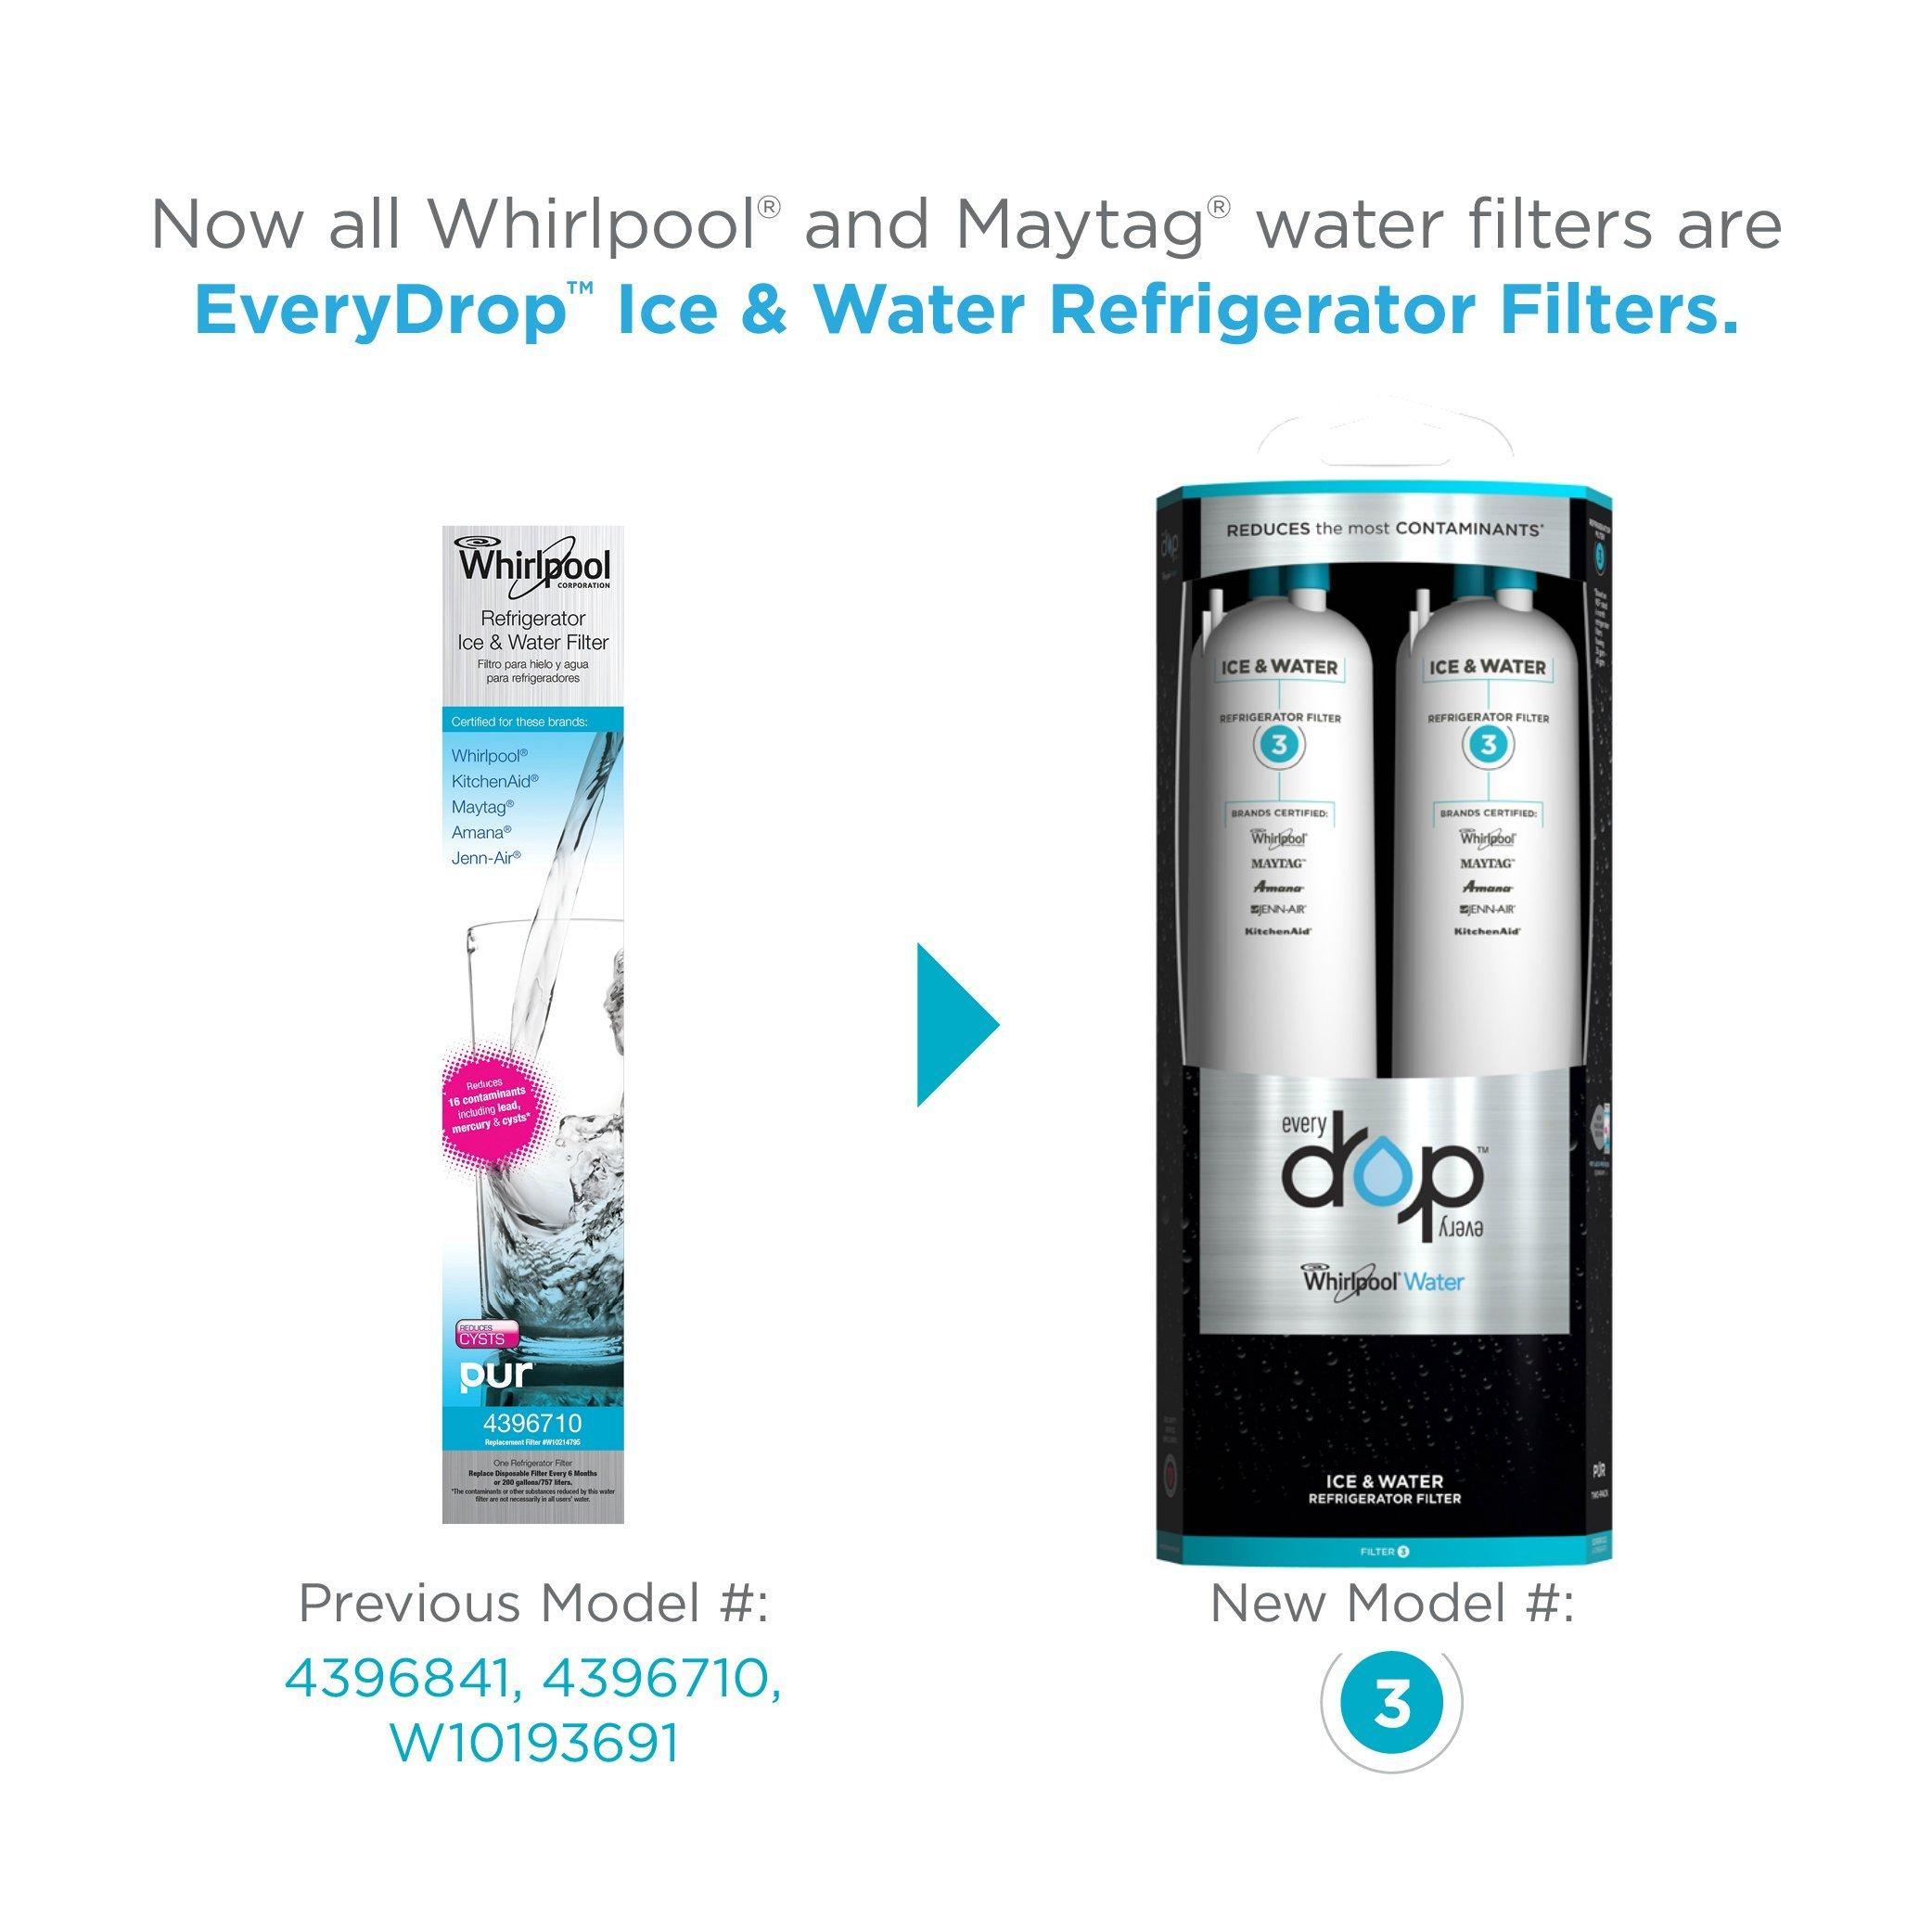 EveryDrop by Whirlpool Refrigerator Water Filter 3 (Pack of 2) by EveryDrop by Whirlpool (Image #2)